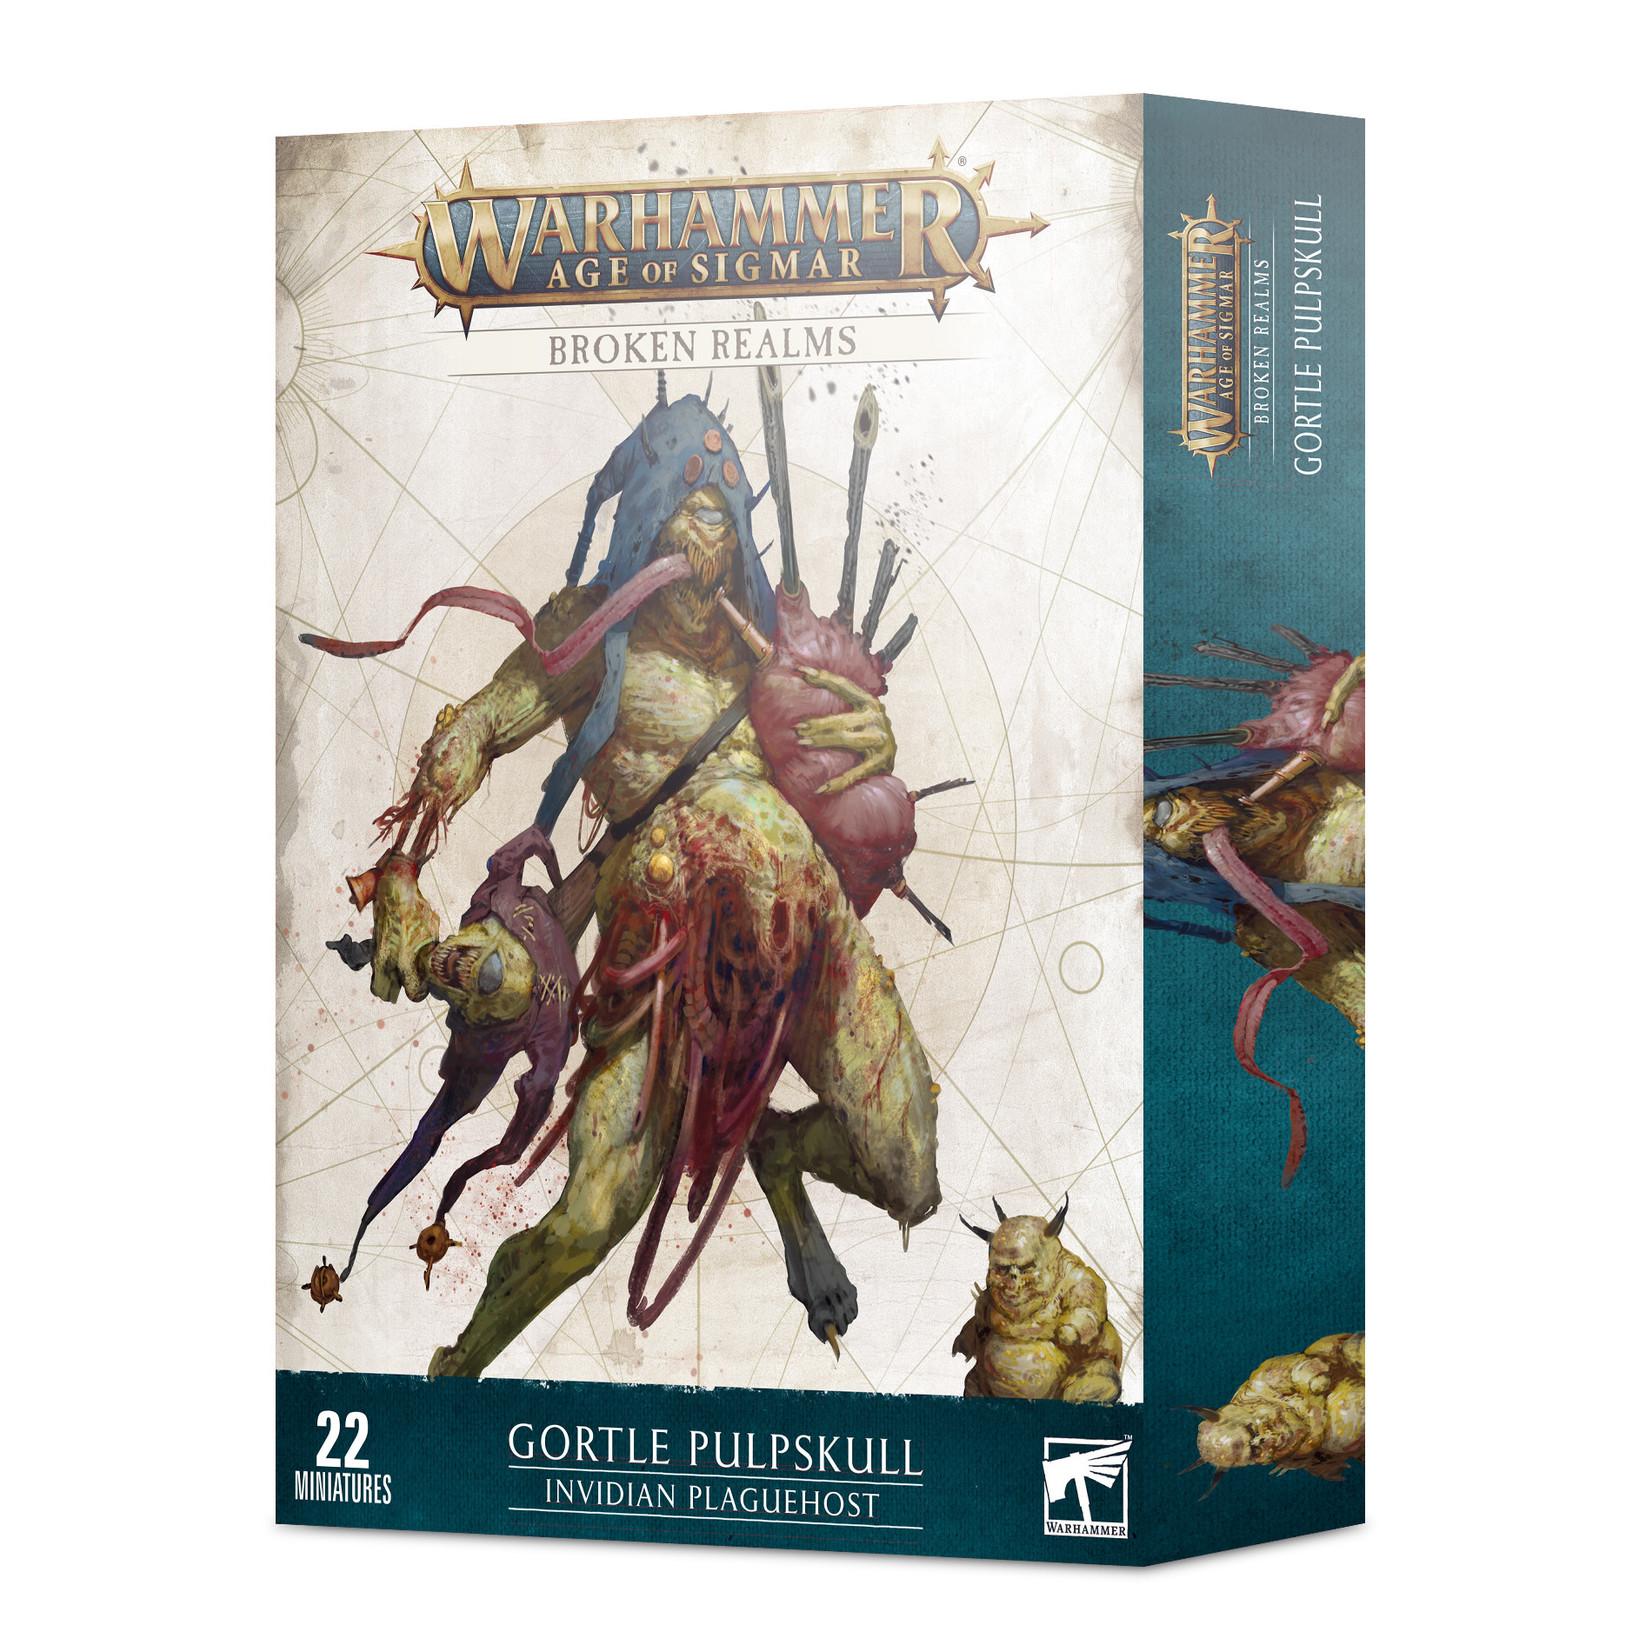 Games Workshop Warhammer Age of Sigmar: Broken Realms -  Invidian Plaguehost